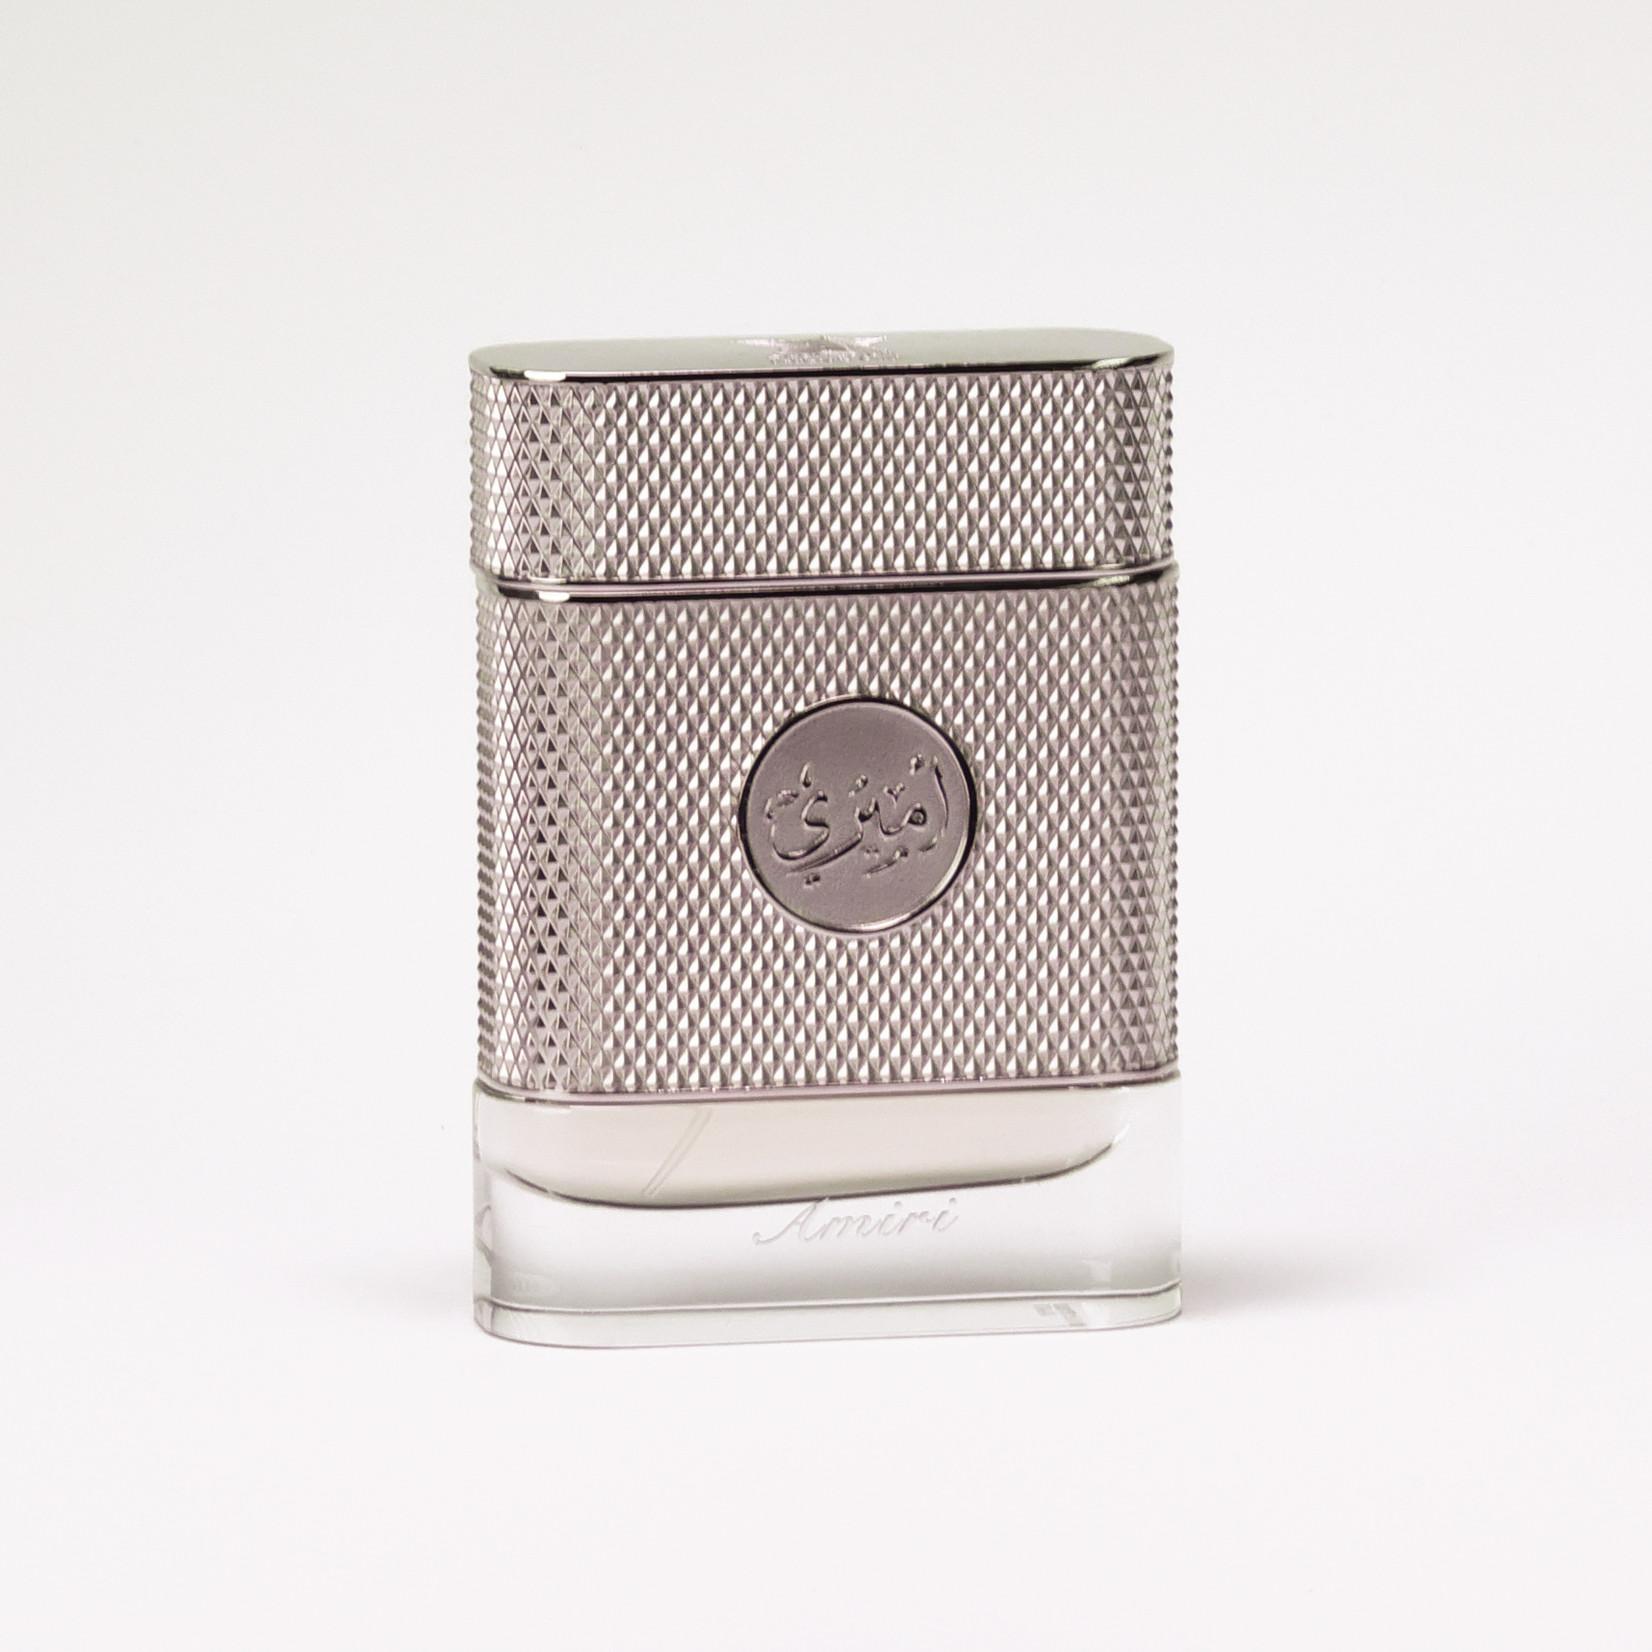 Arabian Oud Amiri (75ml Eau de Parfum)